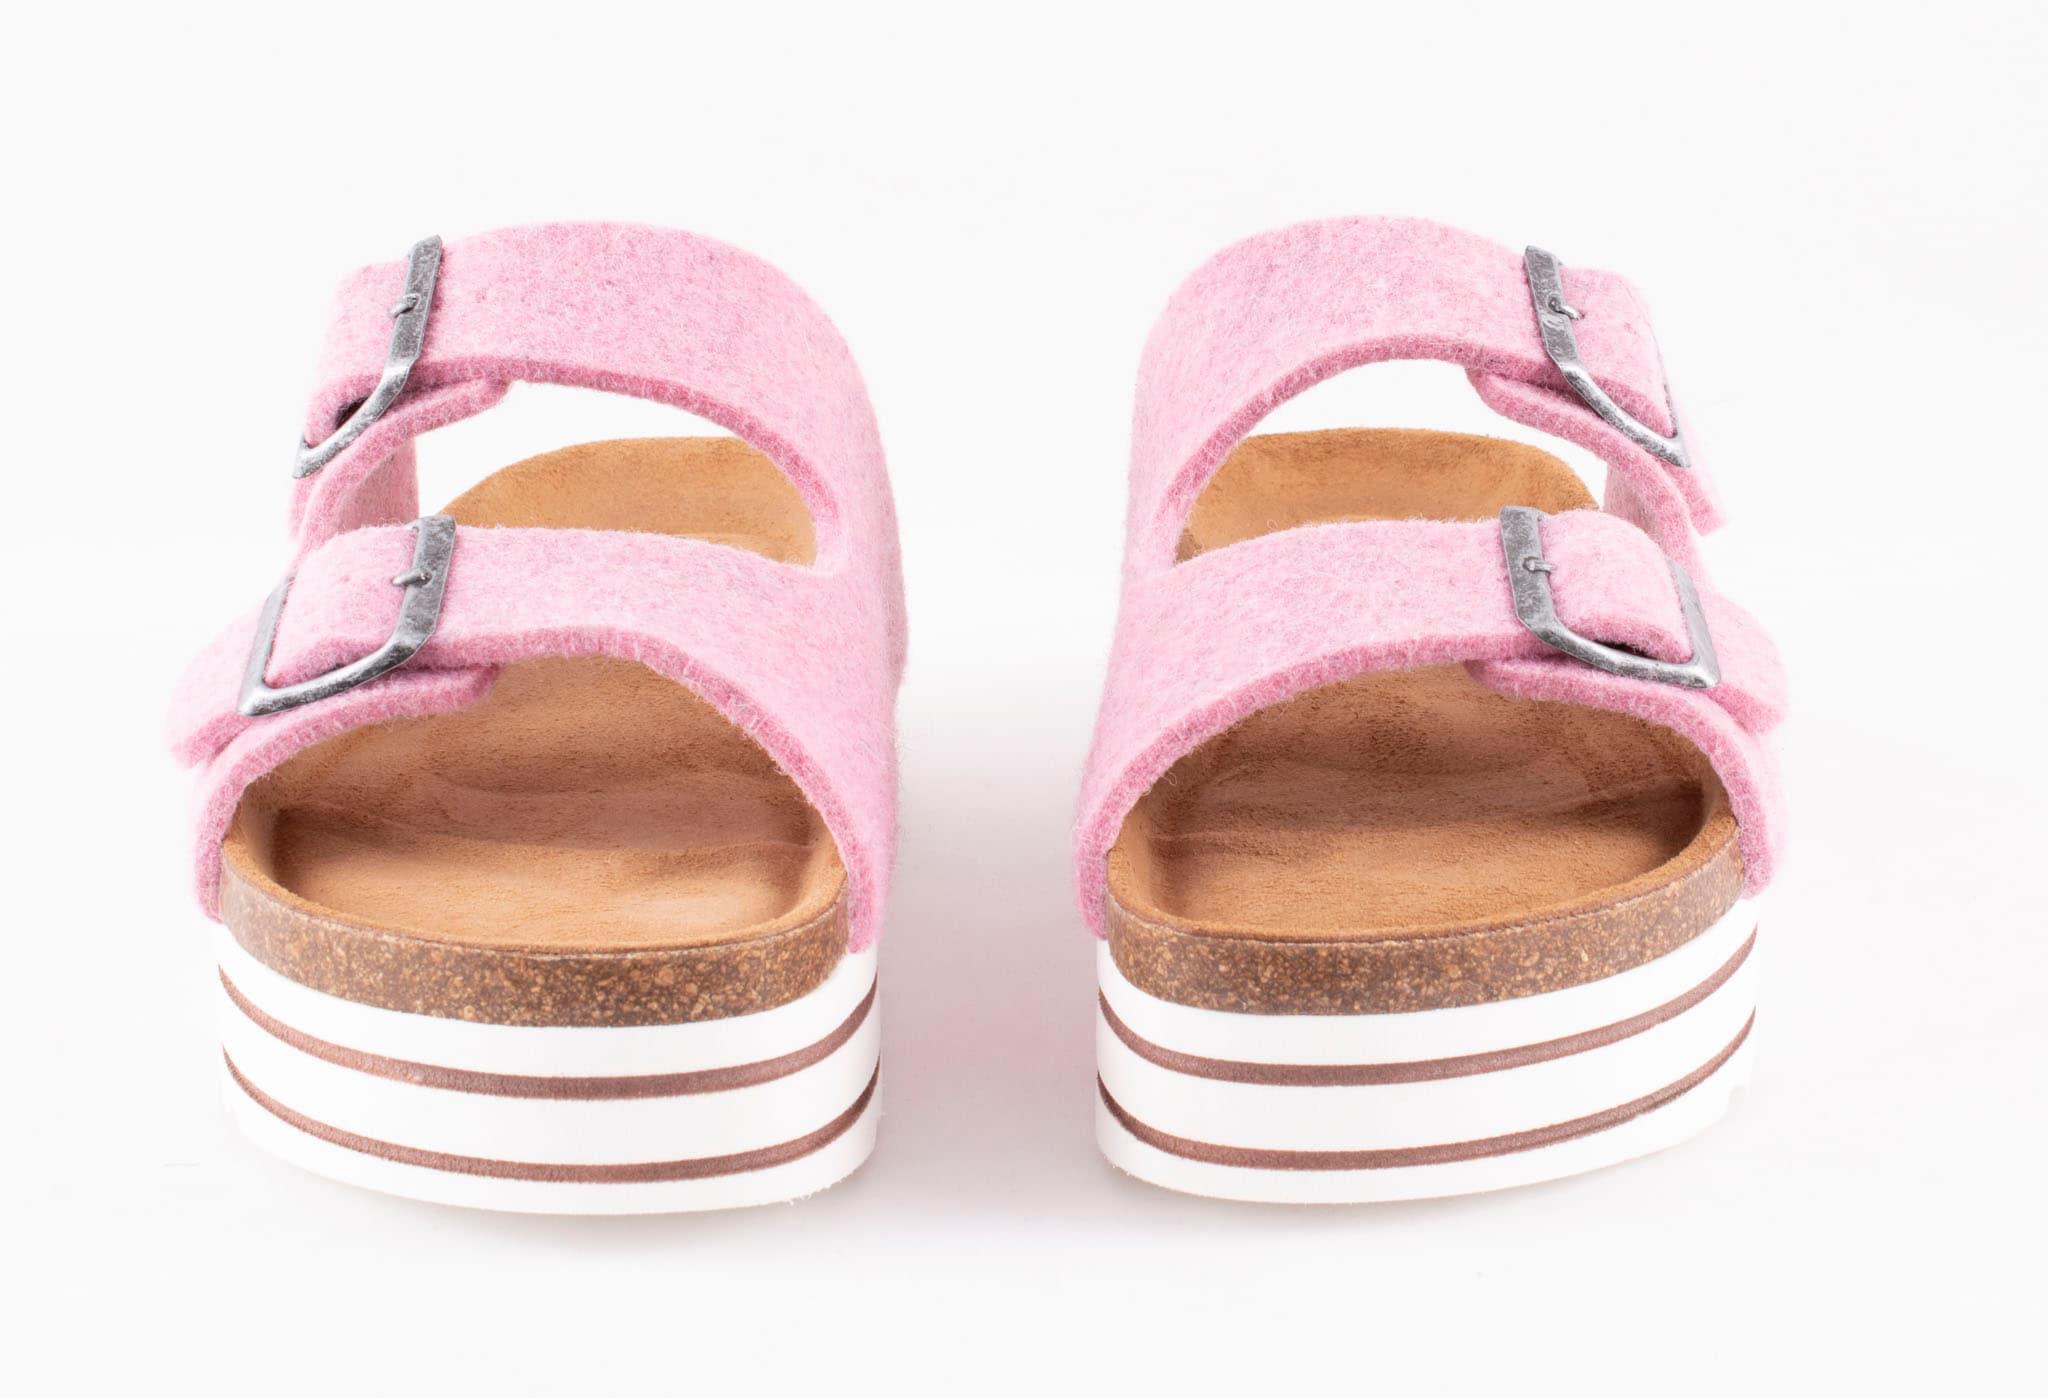 Kattis sandal